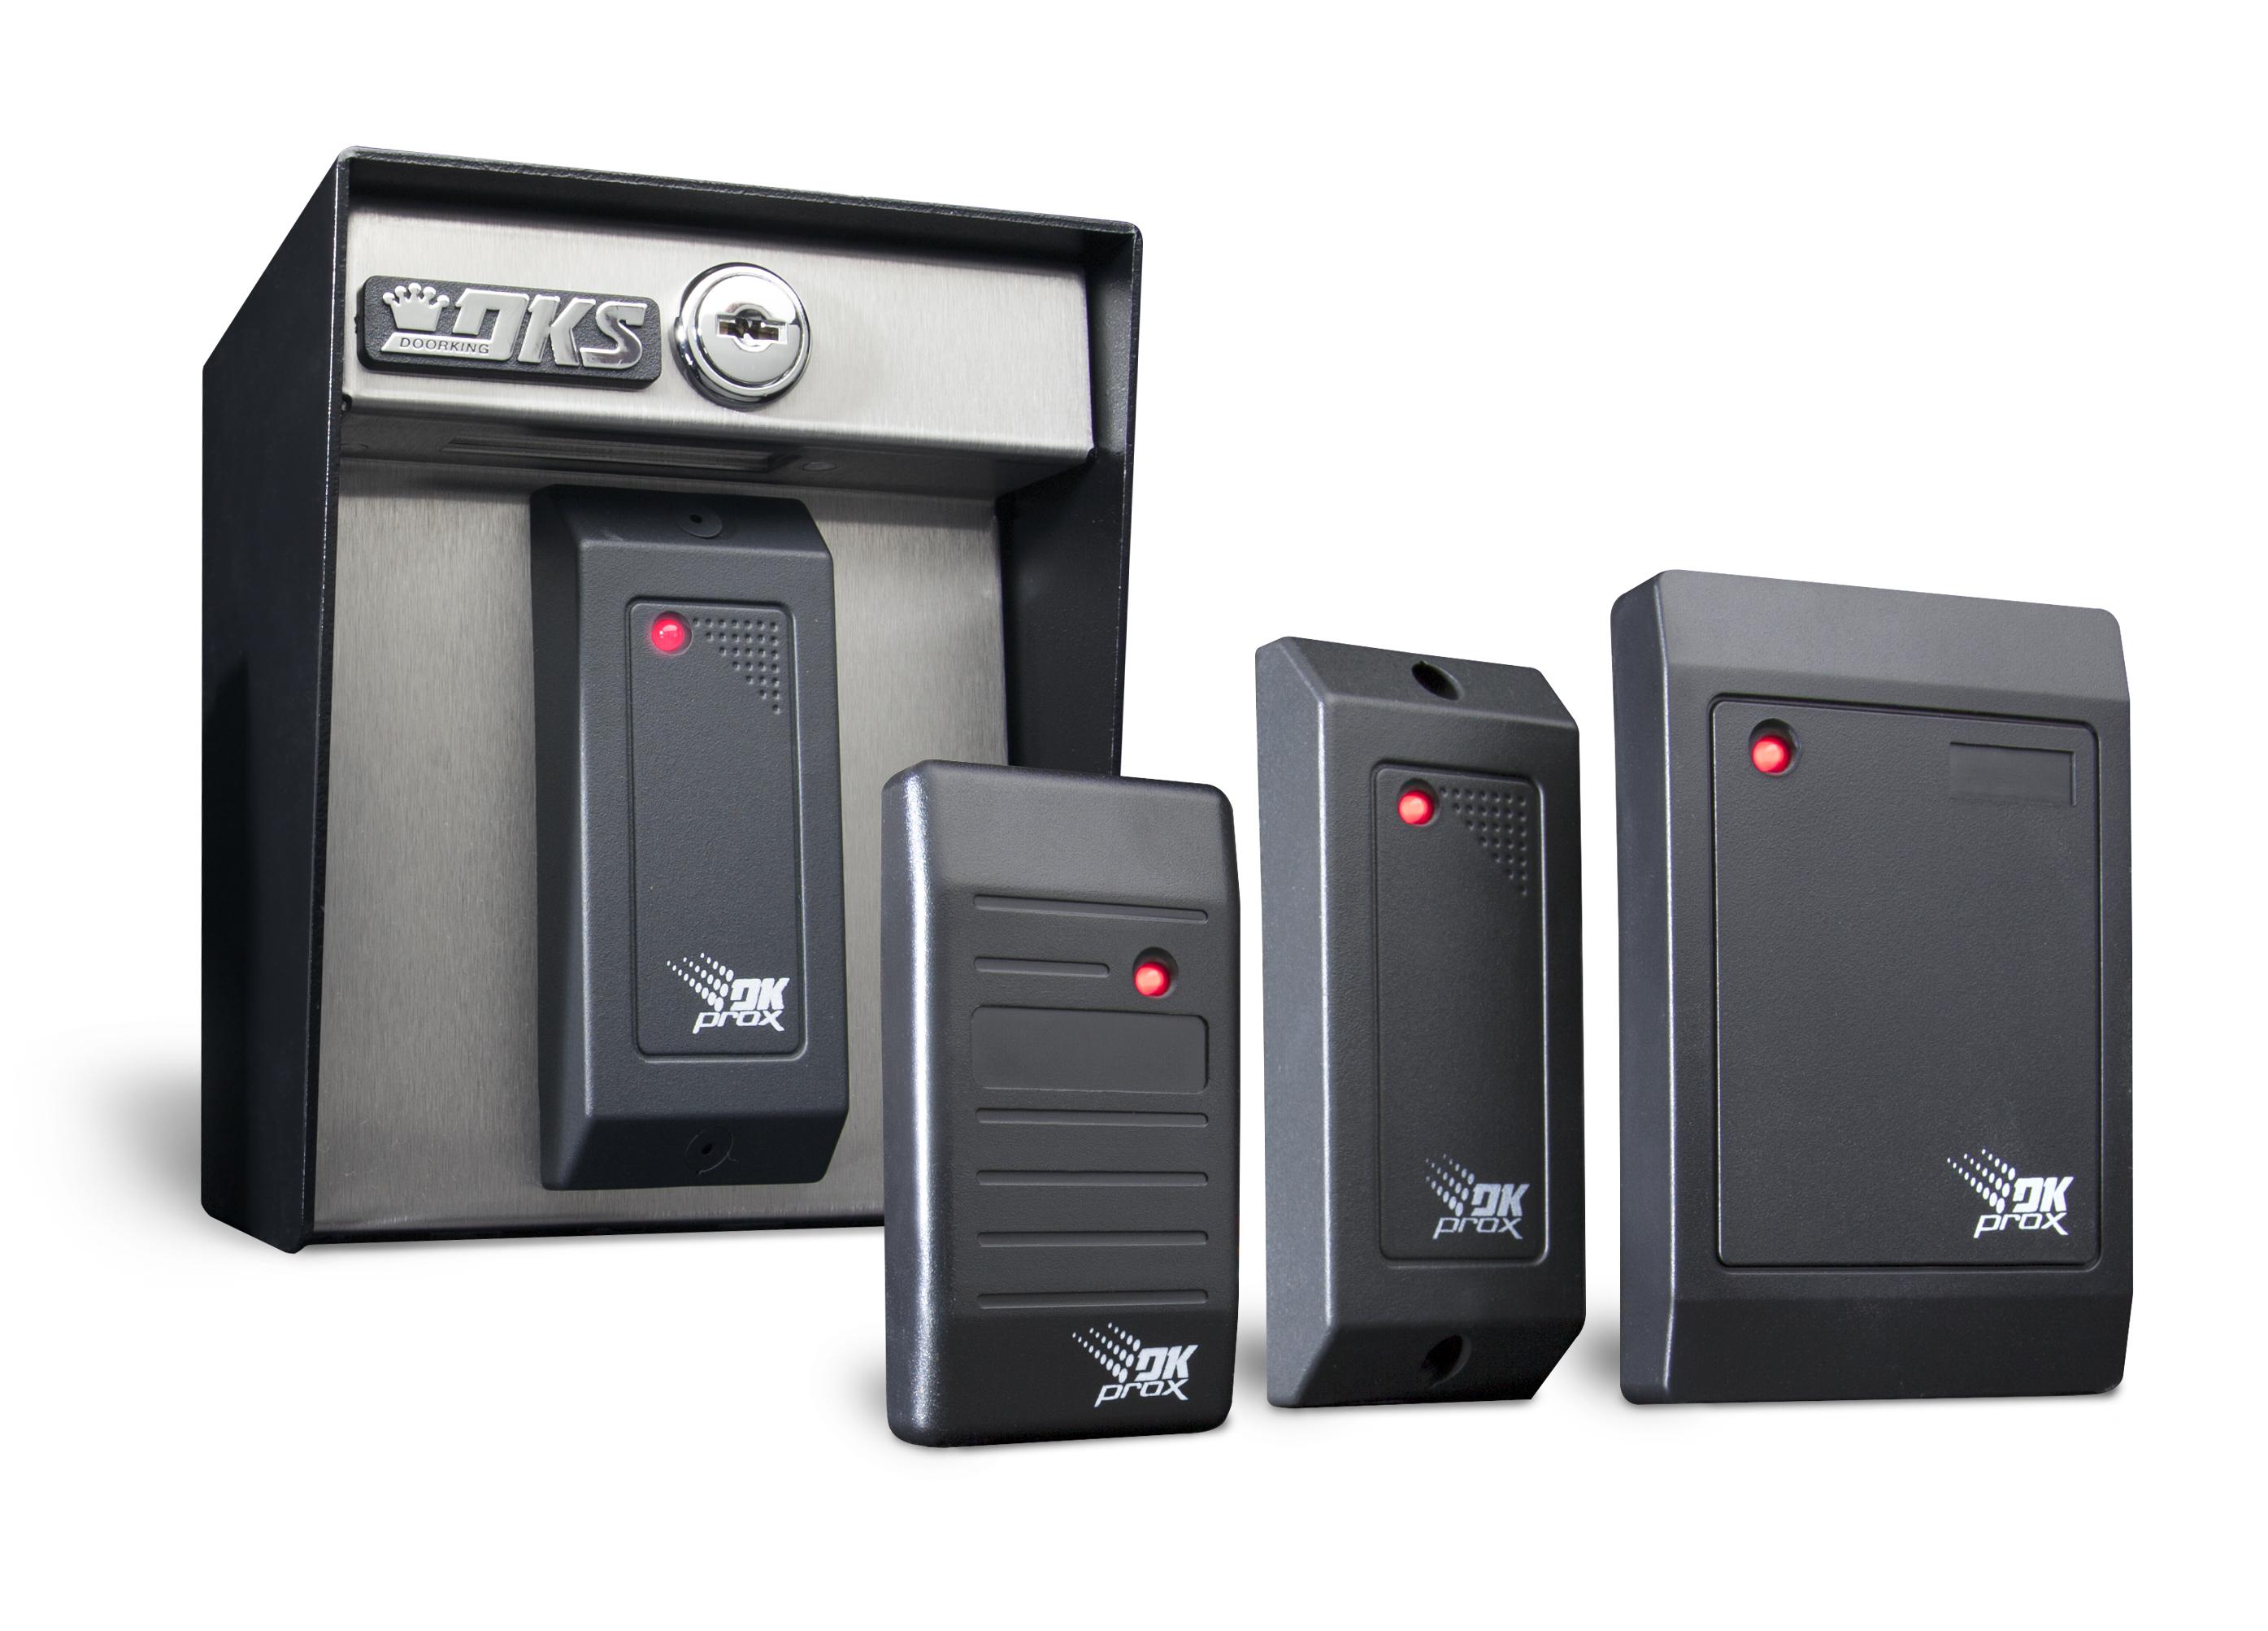 DKS Access Control Card Readers  sc 1 st  ThomasNet & DoorKing Inc. Inglewood California CA 90301 pezcame.com